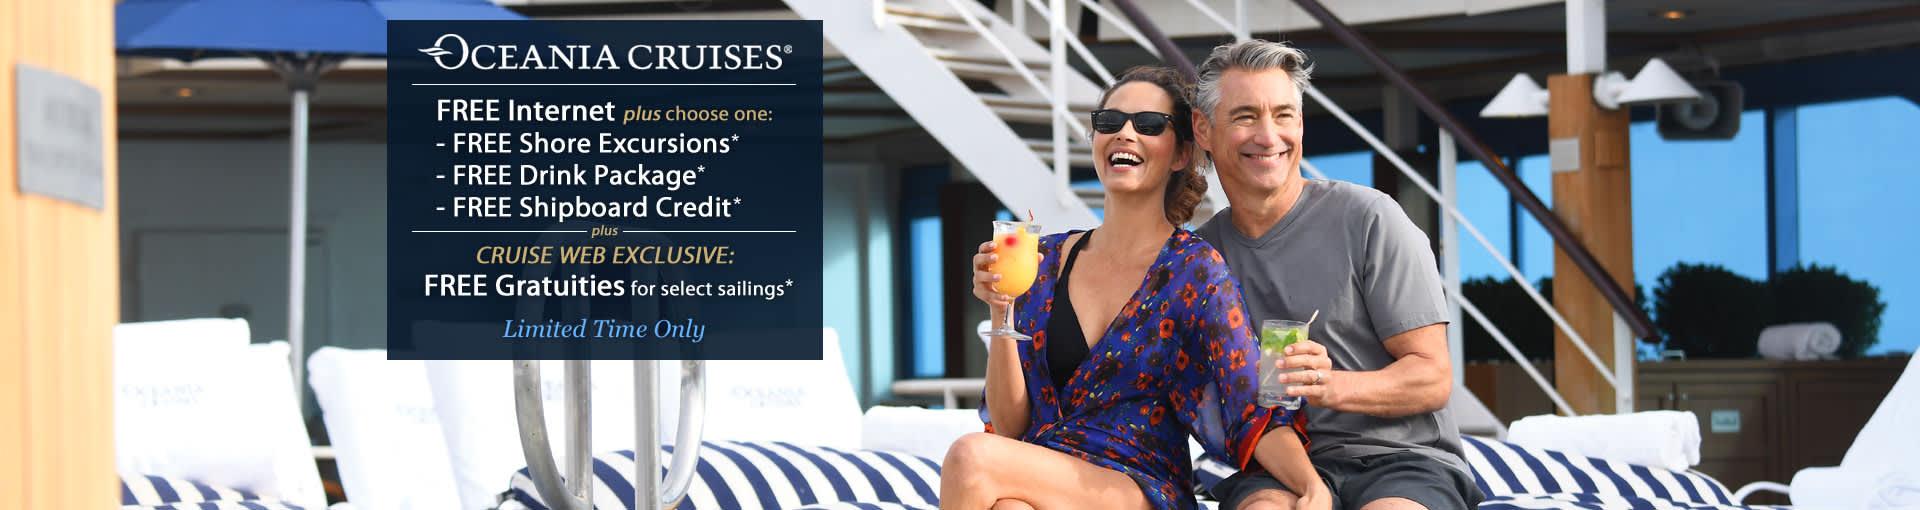 Oceania Cruises - OLife Choice Sale